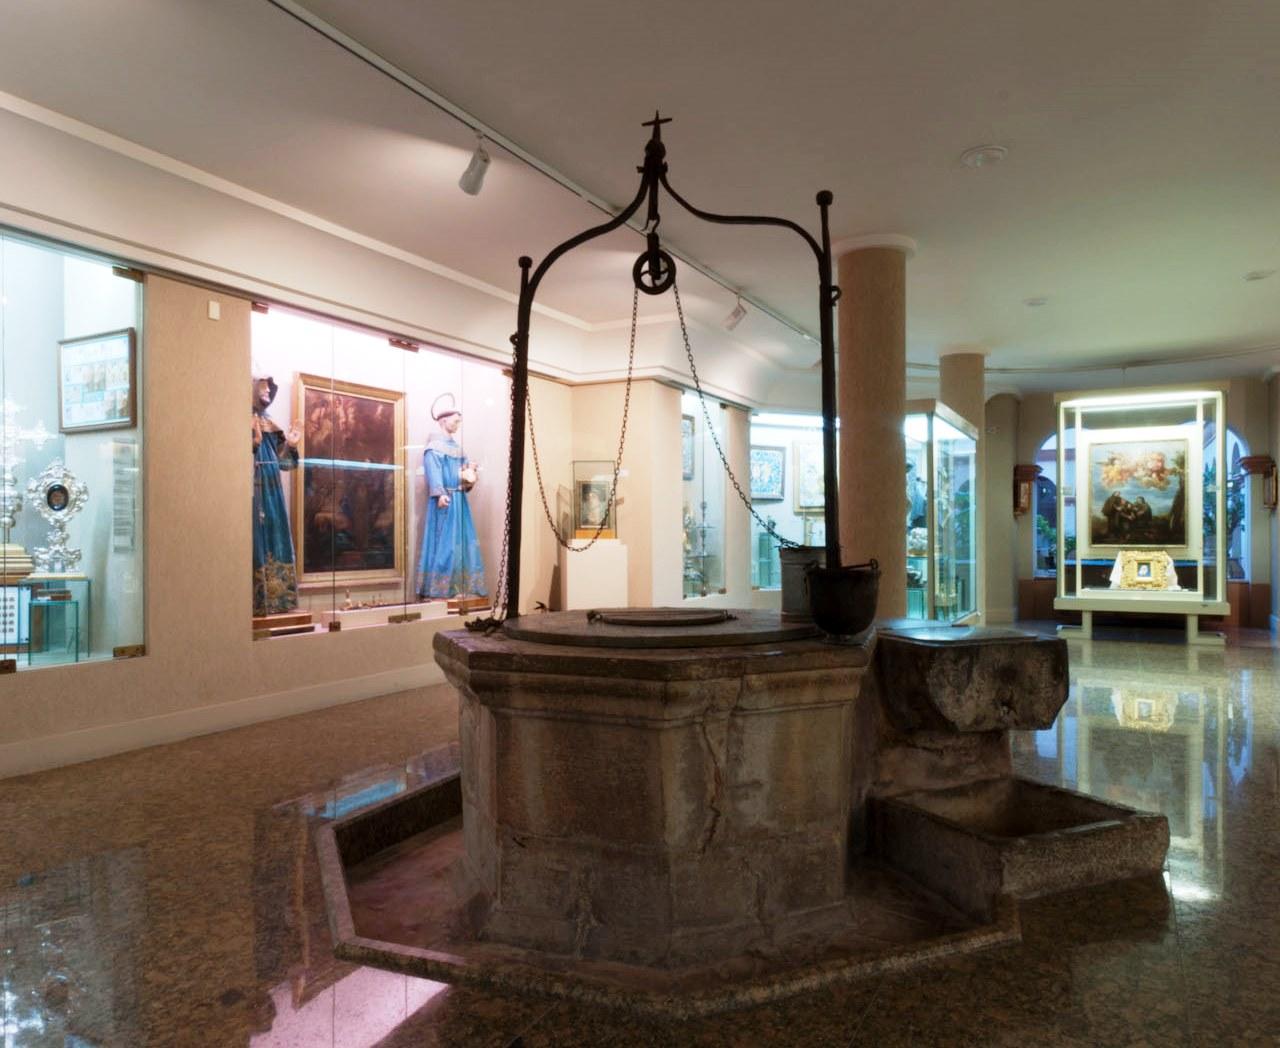 Museo del pouet del sant bas lica de san pascual for Horario piscina vila real